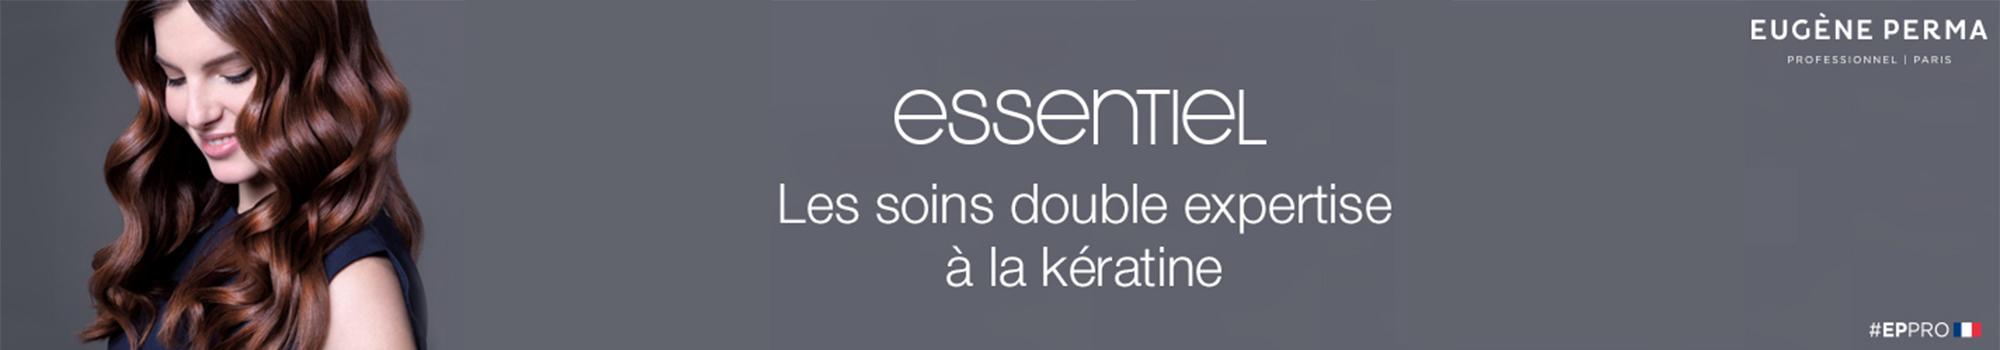 Essentiel Eugène Perma